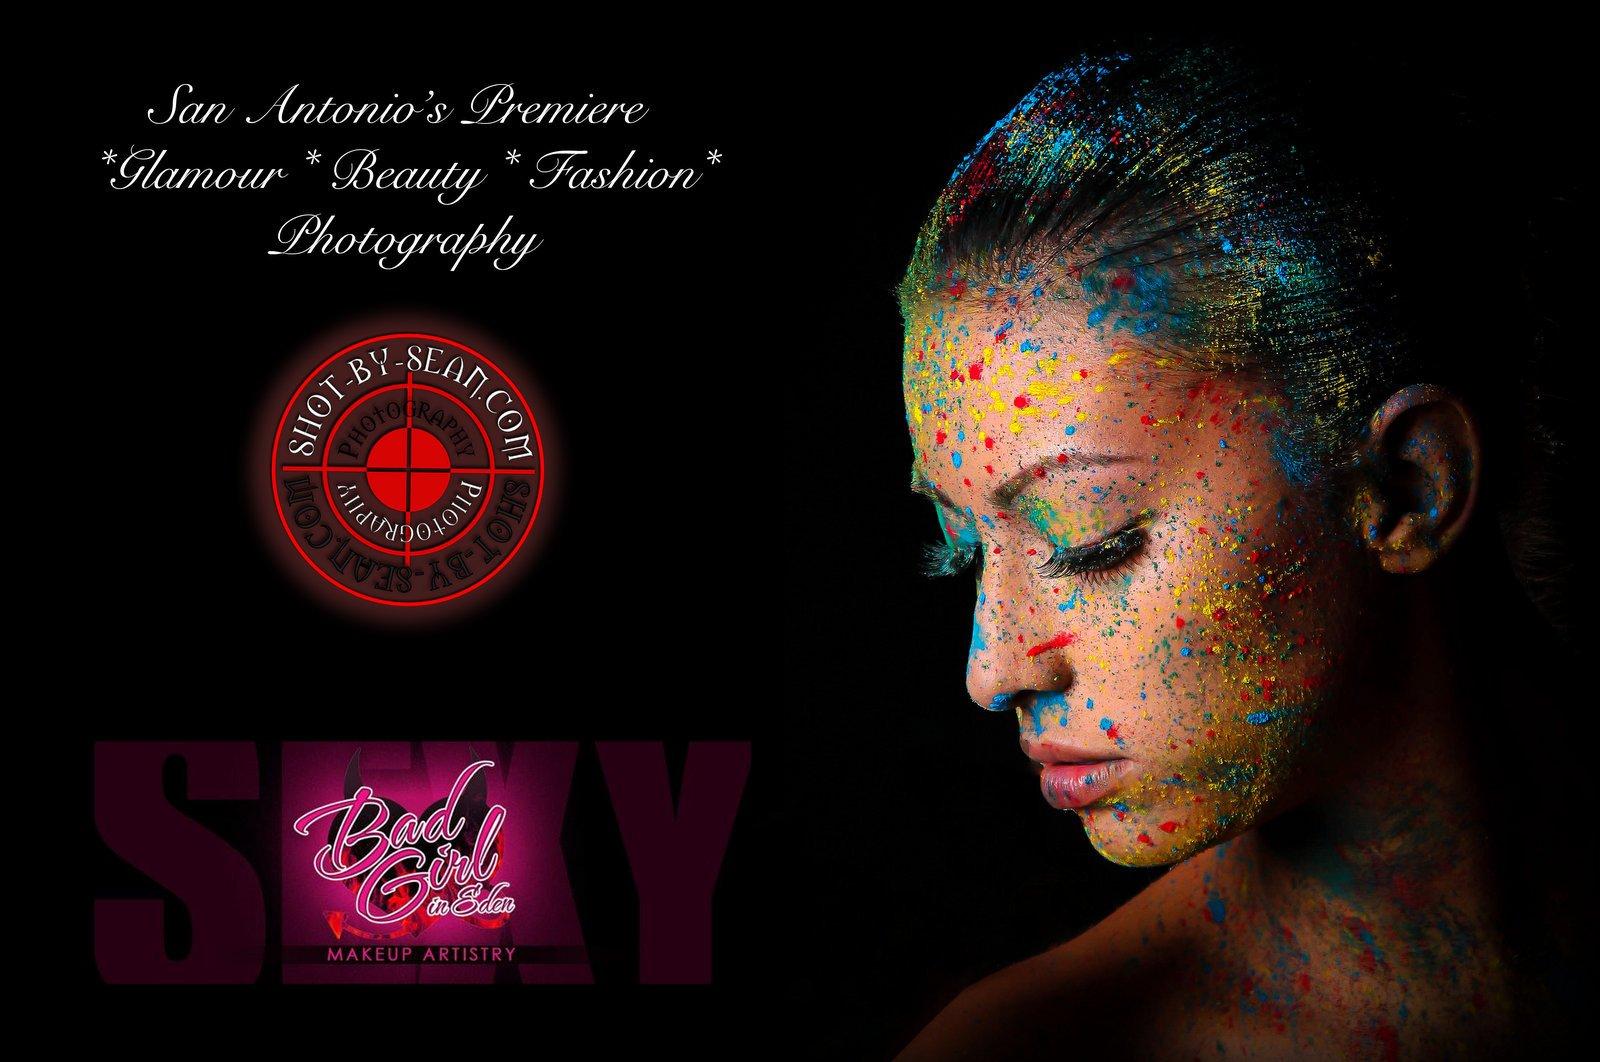 Saxy Golden Glitter Implied Nude Glamour Lighting ...